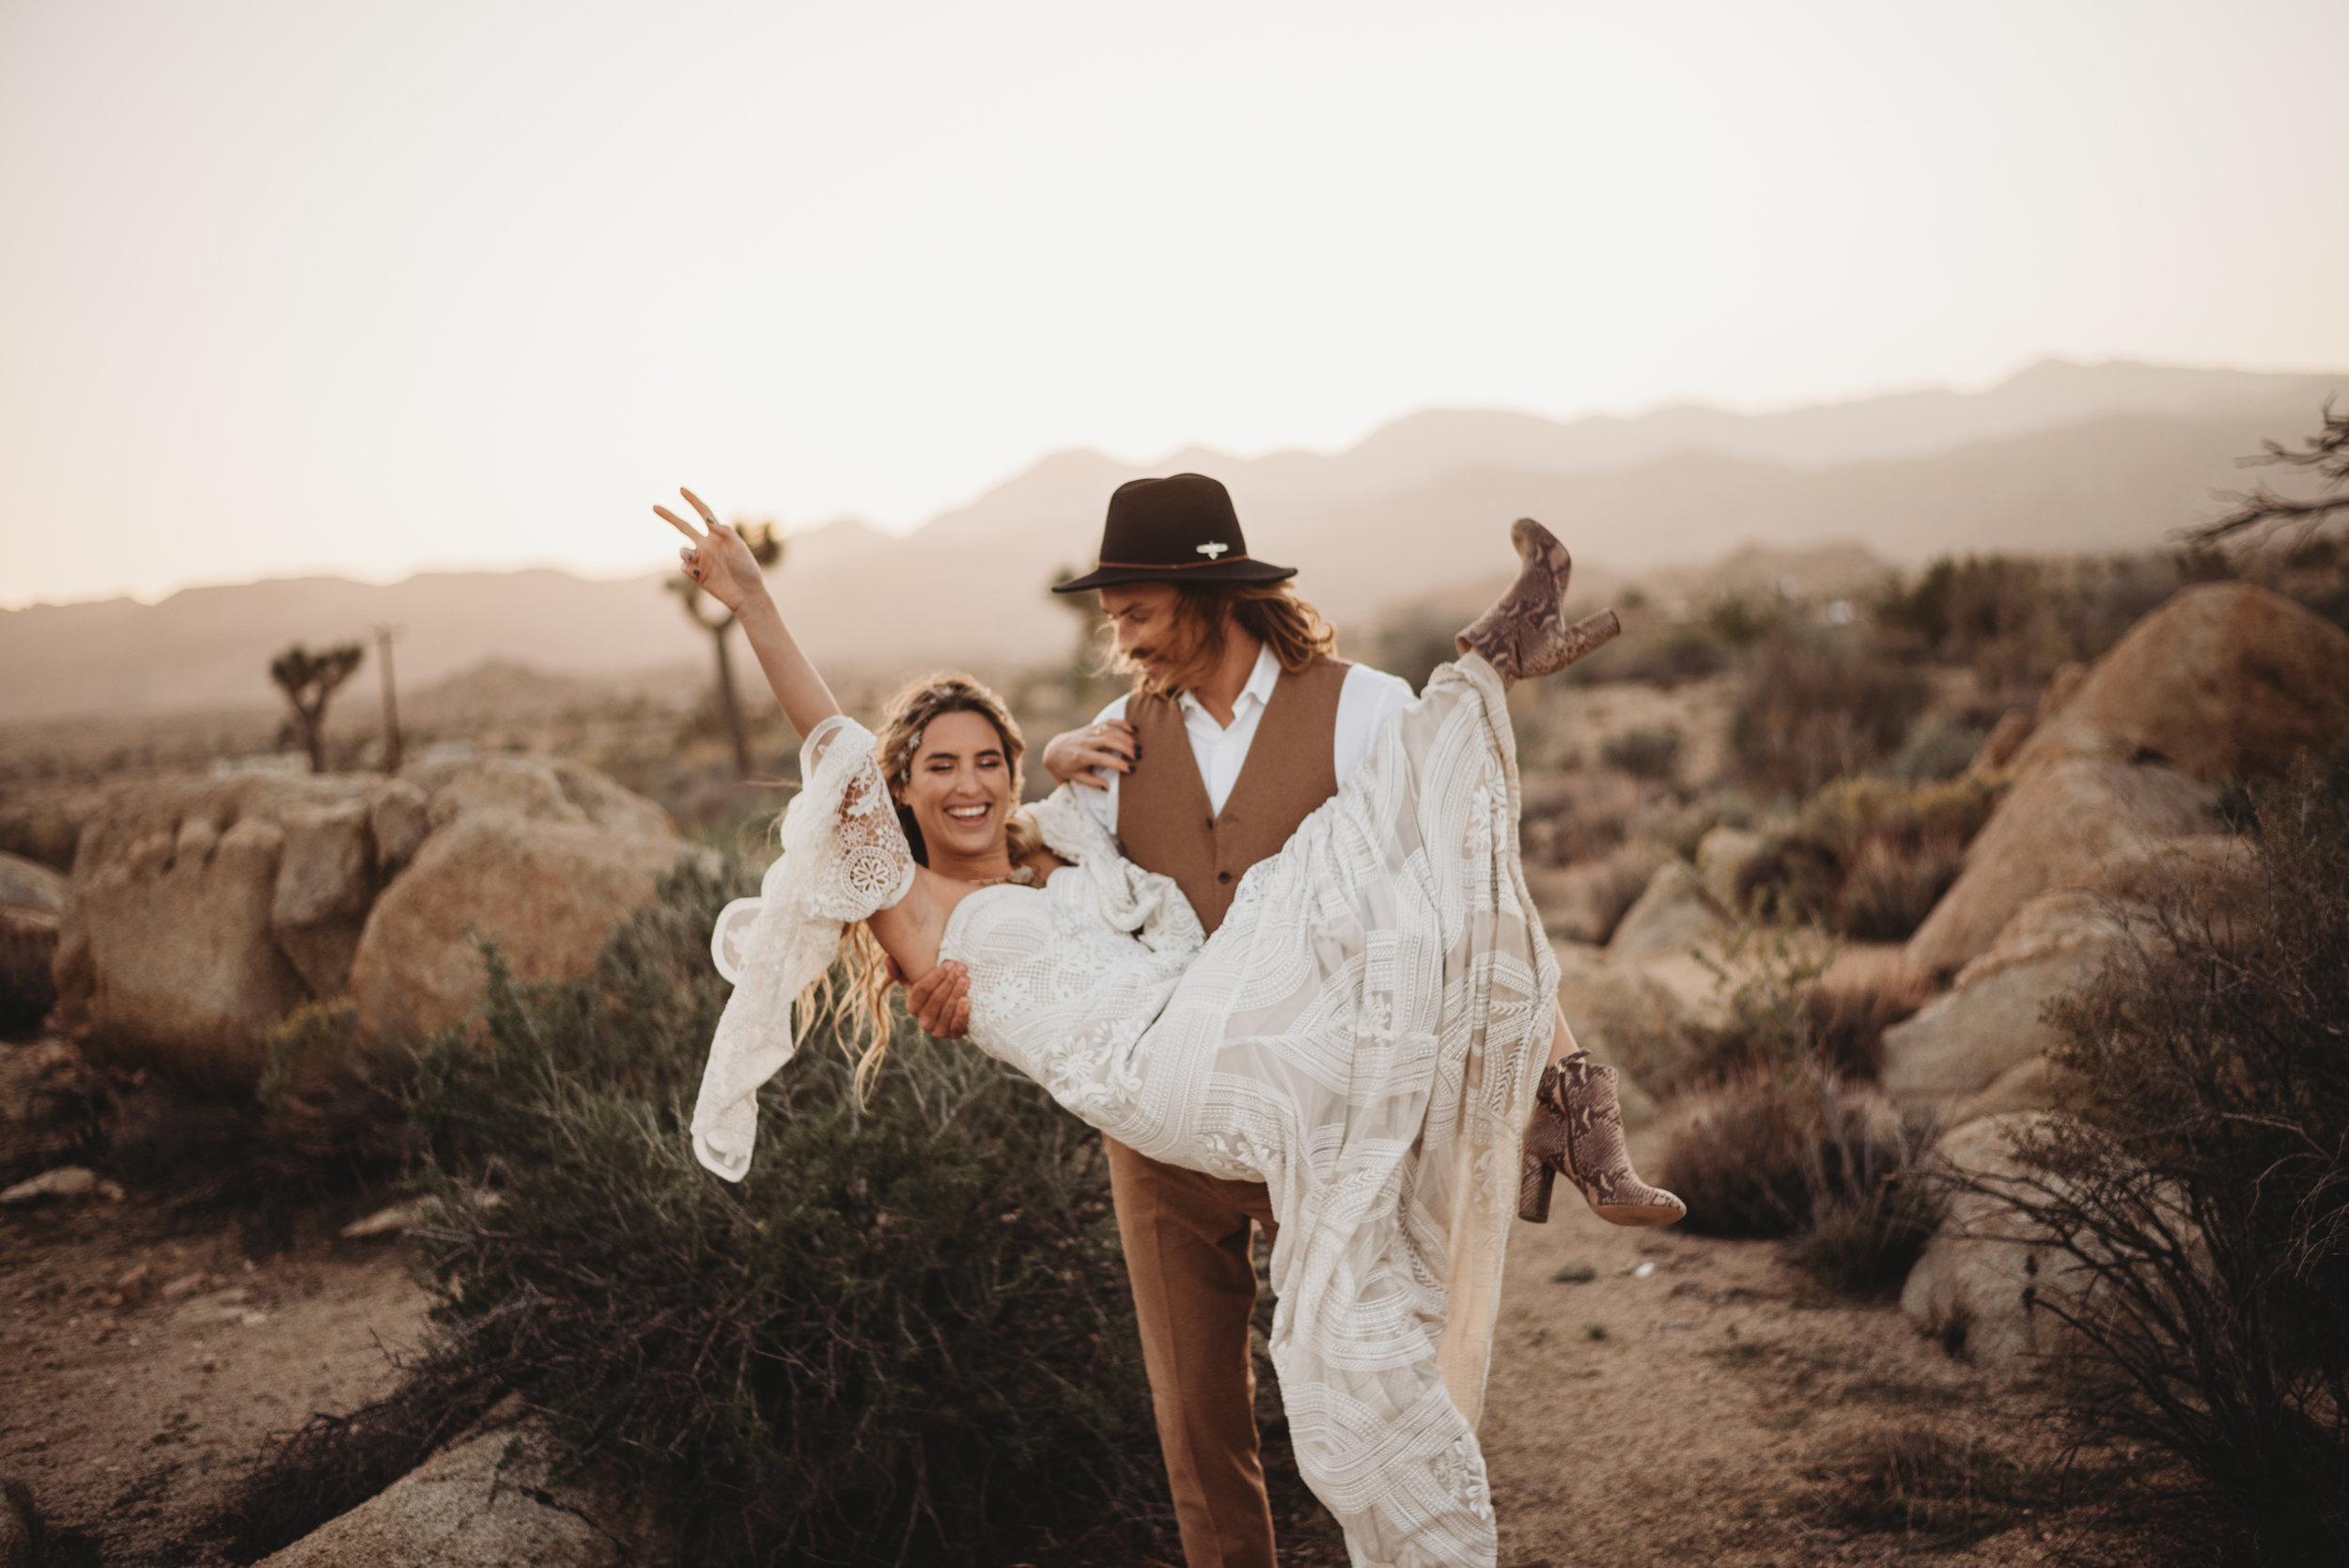 FortSt.John_photographer_TyraEPhotography_Wedding_Couple_Family_Photograhy_DawsonCreek_Elopement_Bride_Boduoir_Portraits-8692.jpg